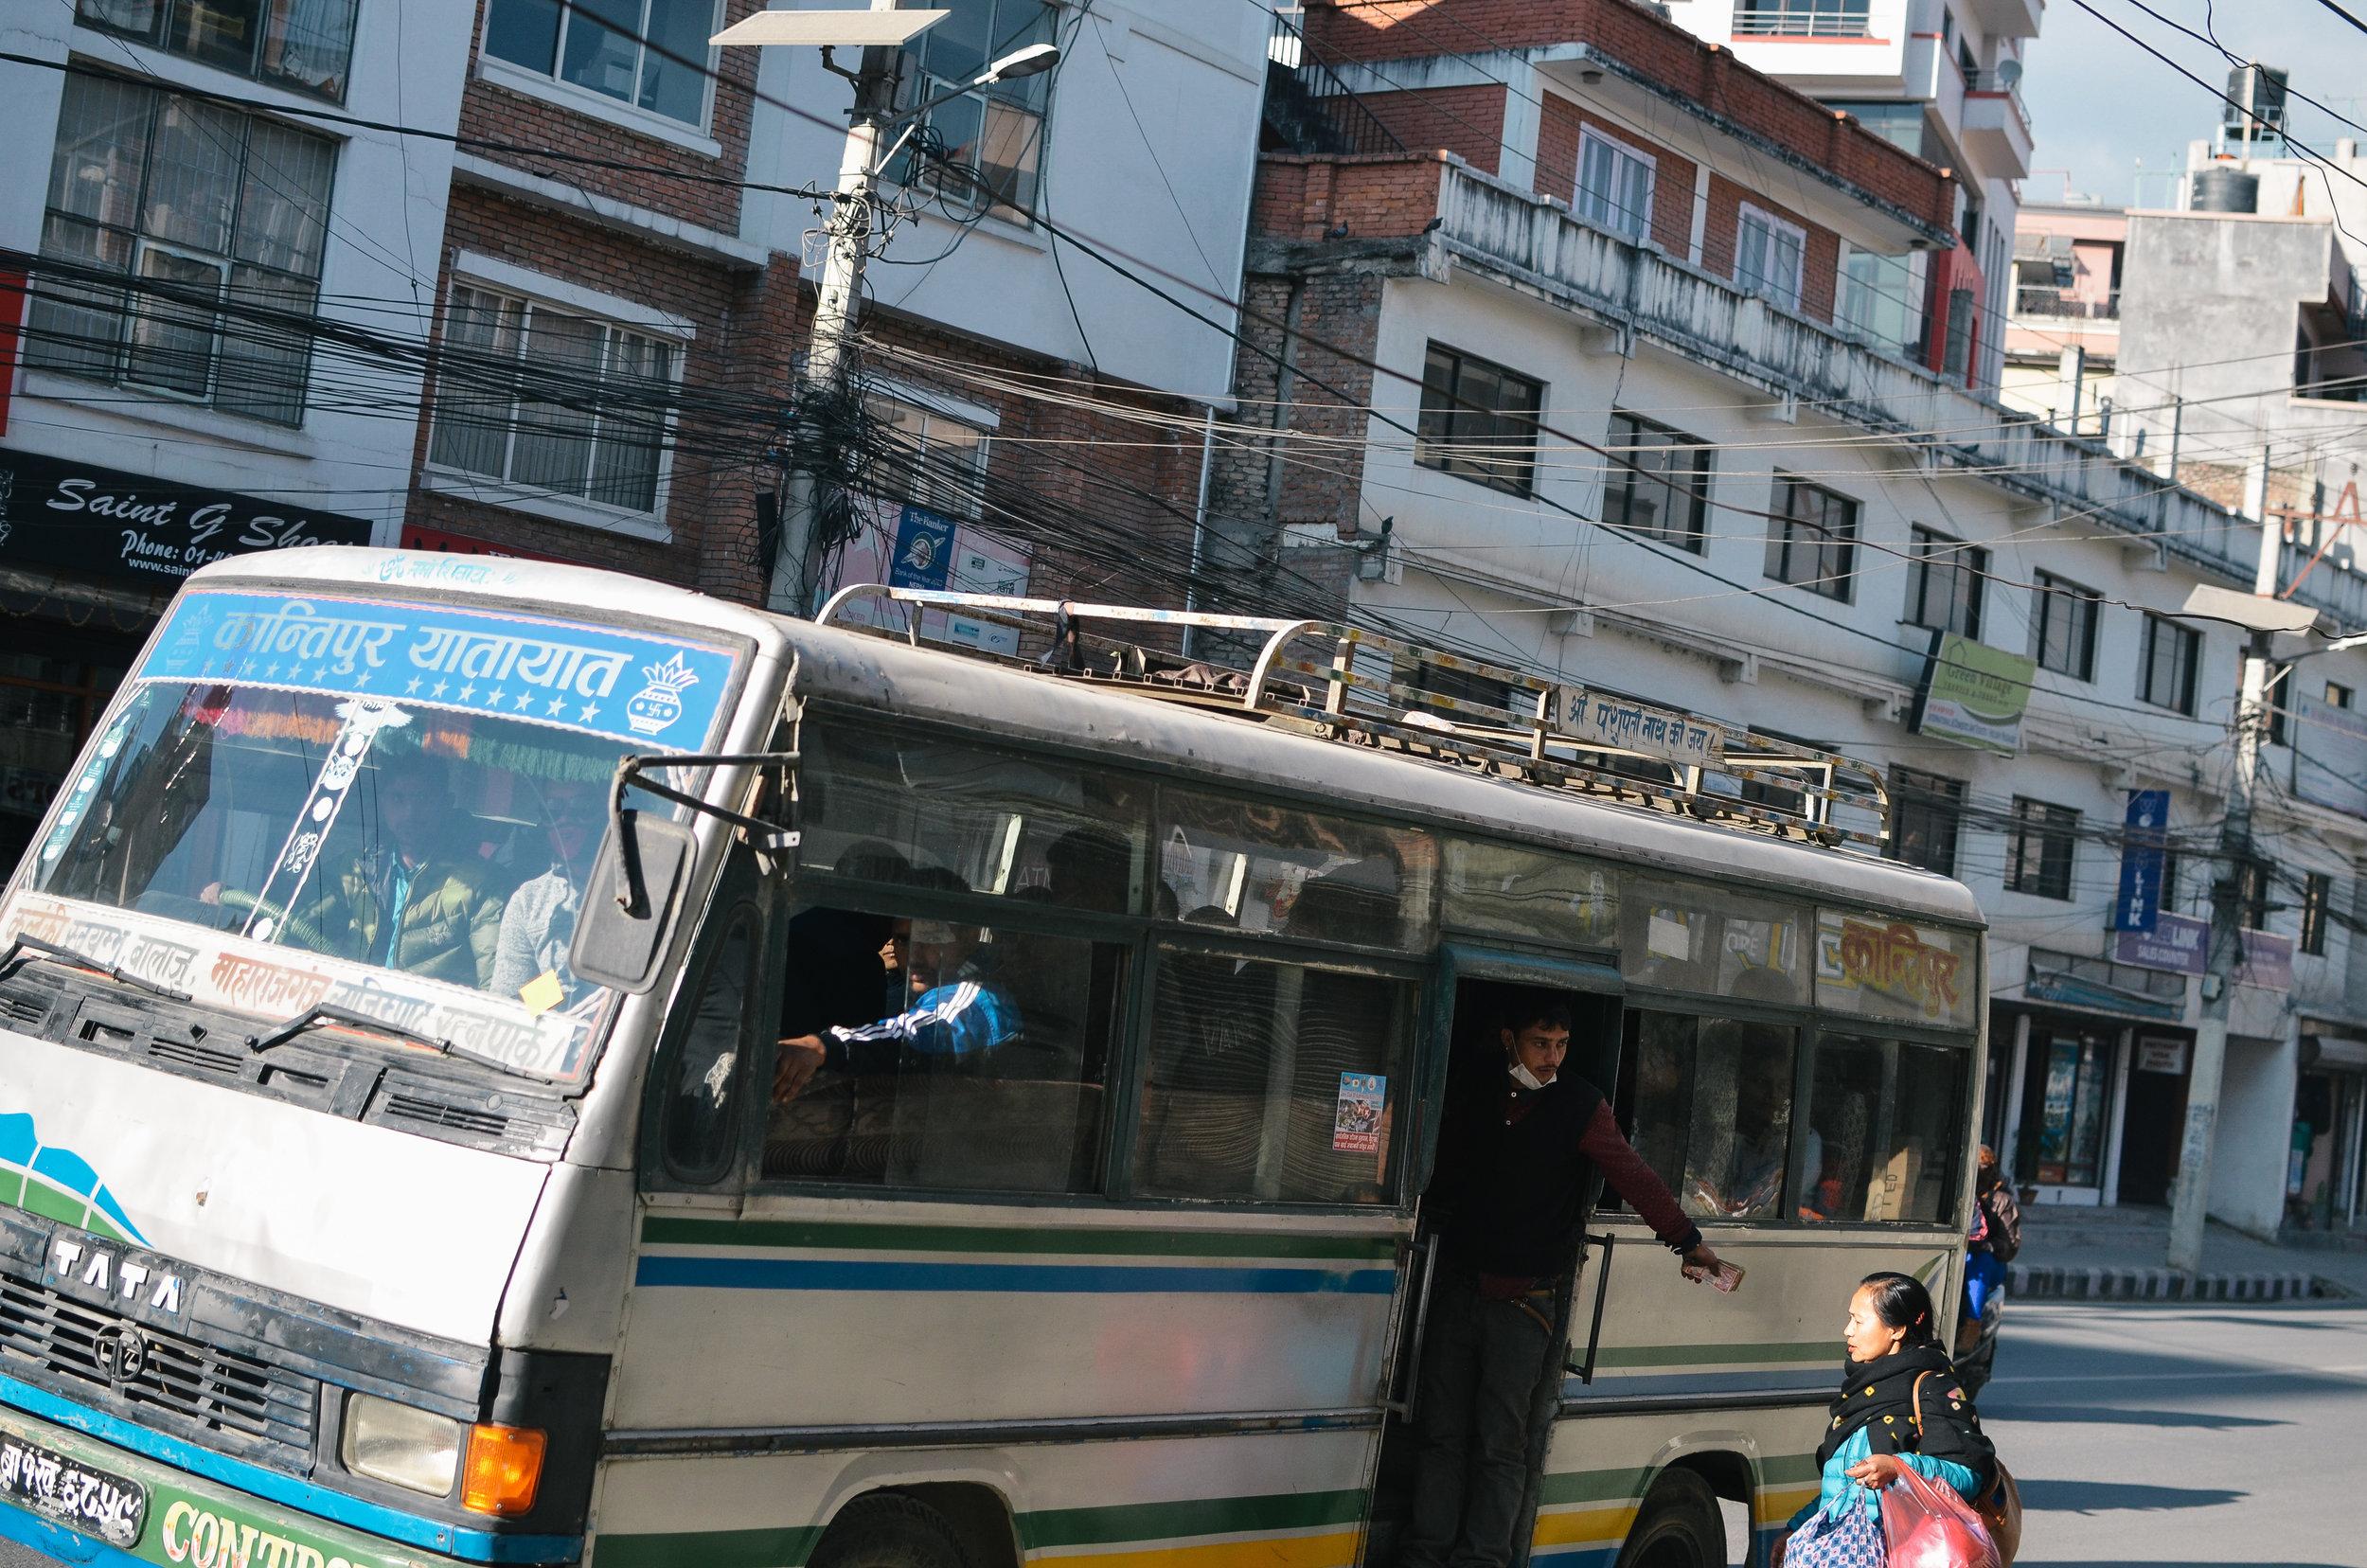 10-things-to-know-kathmandu-nepal-lifeonpine_DSC_0550.jpg